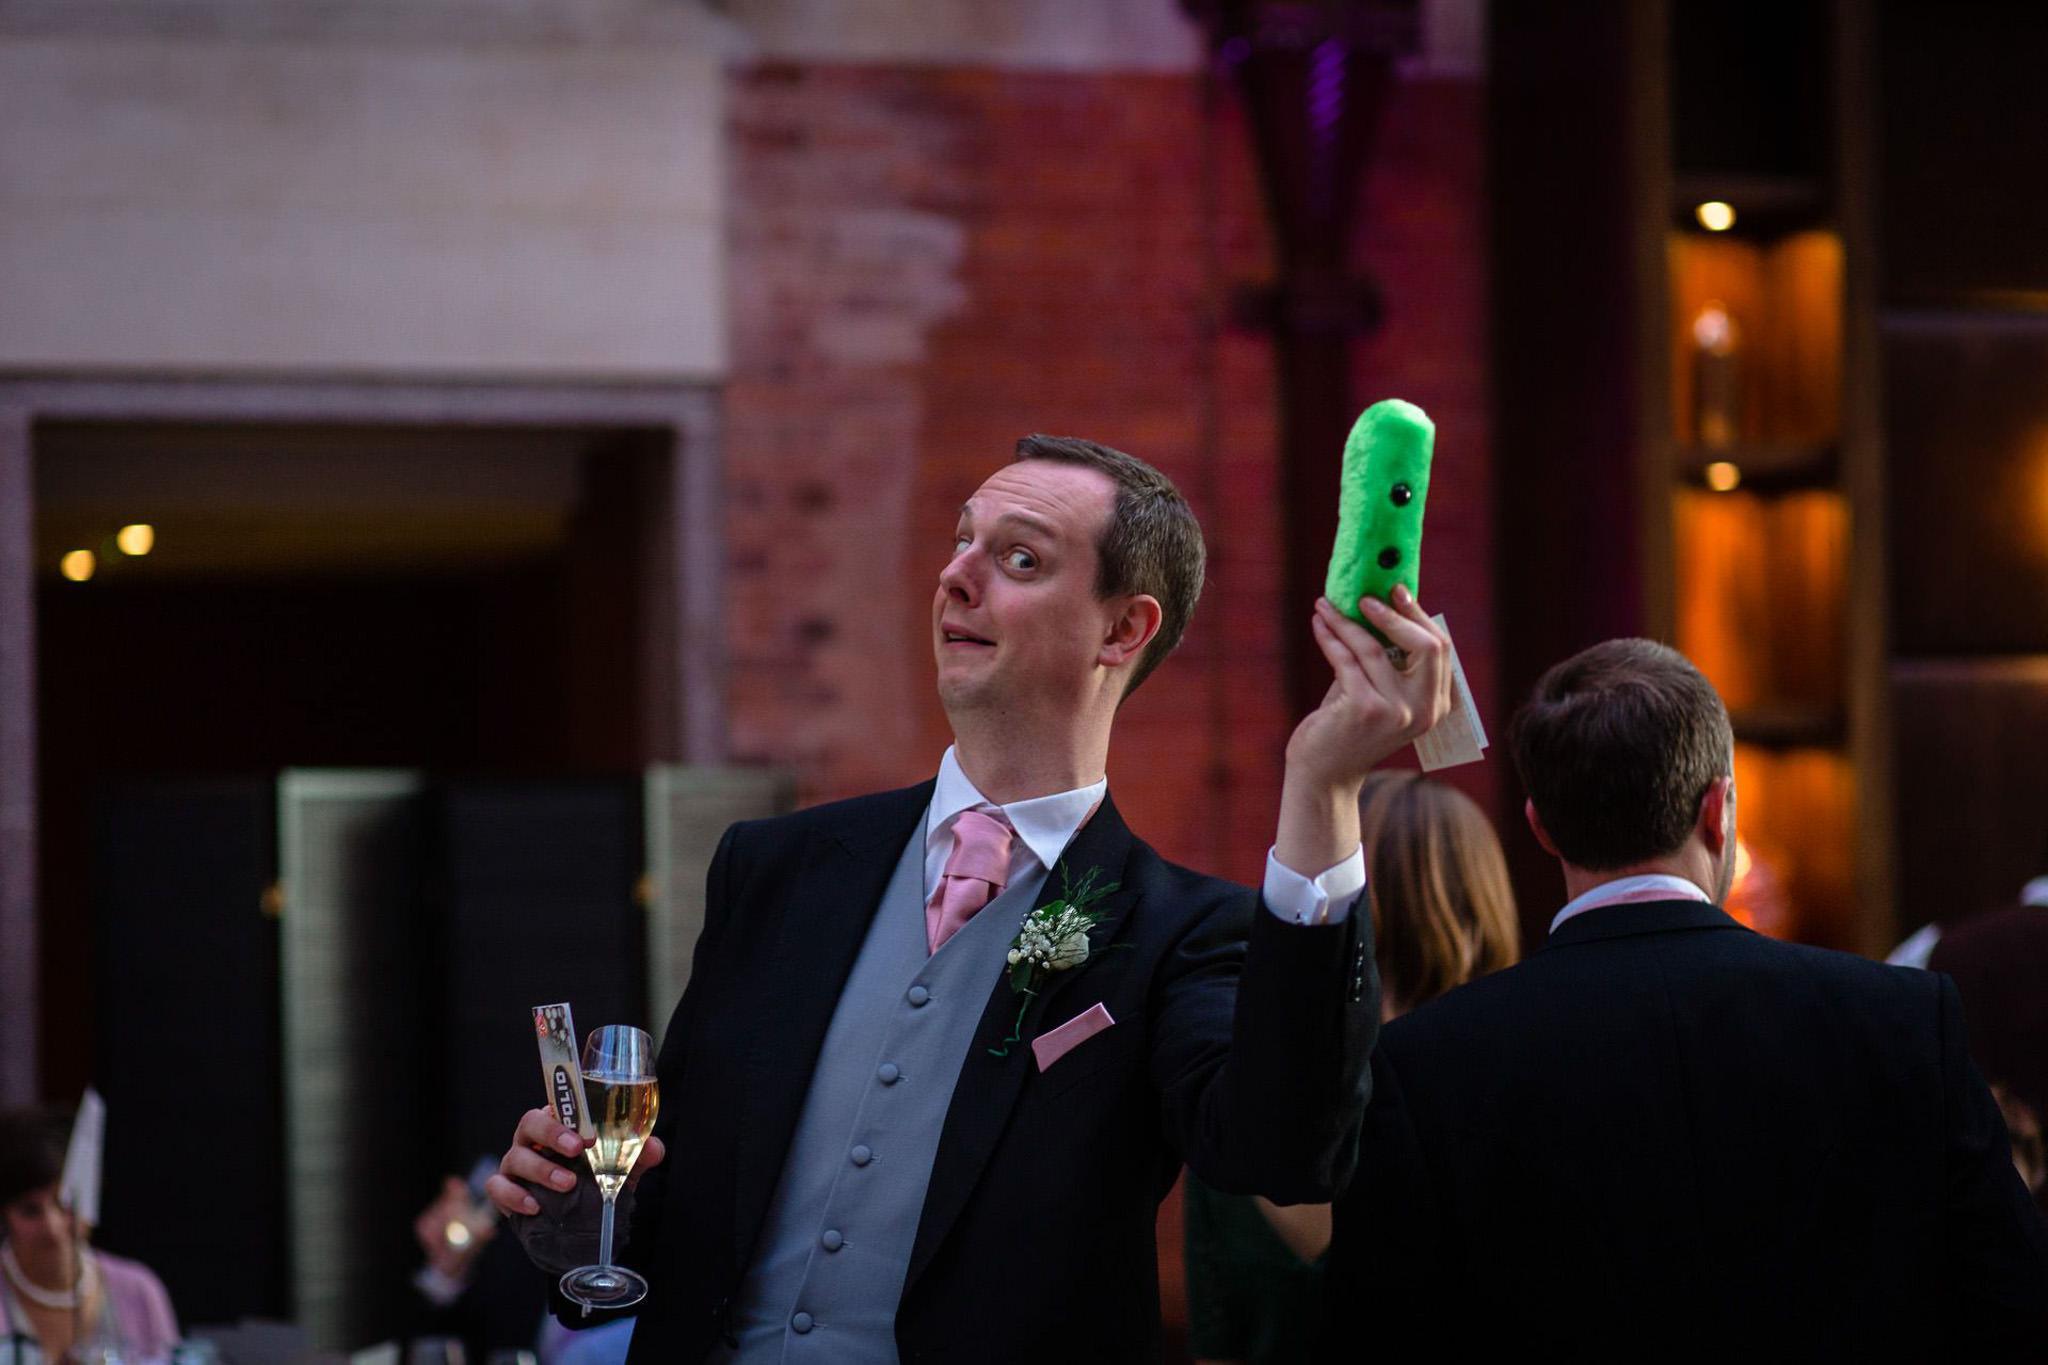 St. Pancras hotel wedding guests having fun